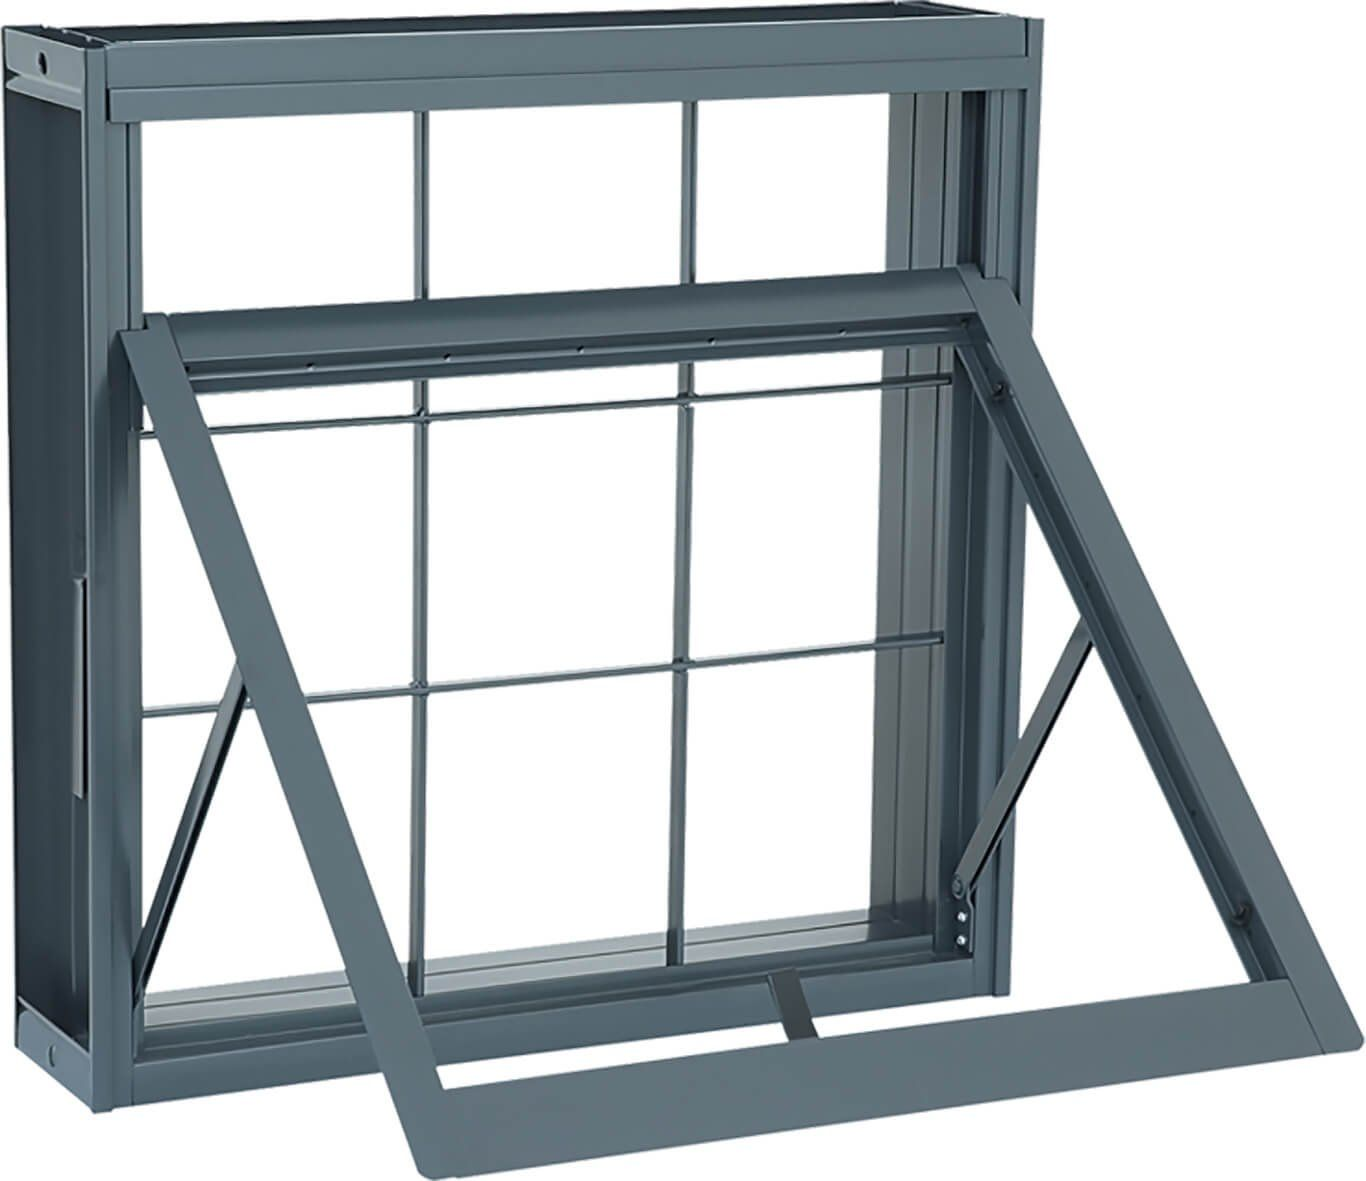 Silenfort Janela Maxim-Ar - 0.60x0.60x08  SasazakiRef. 64.34.101-4